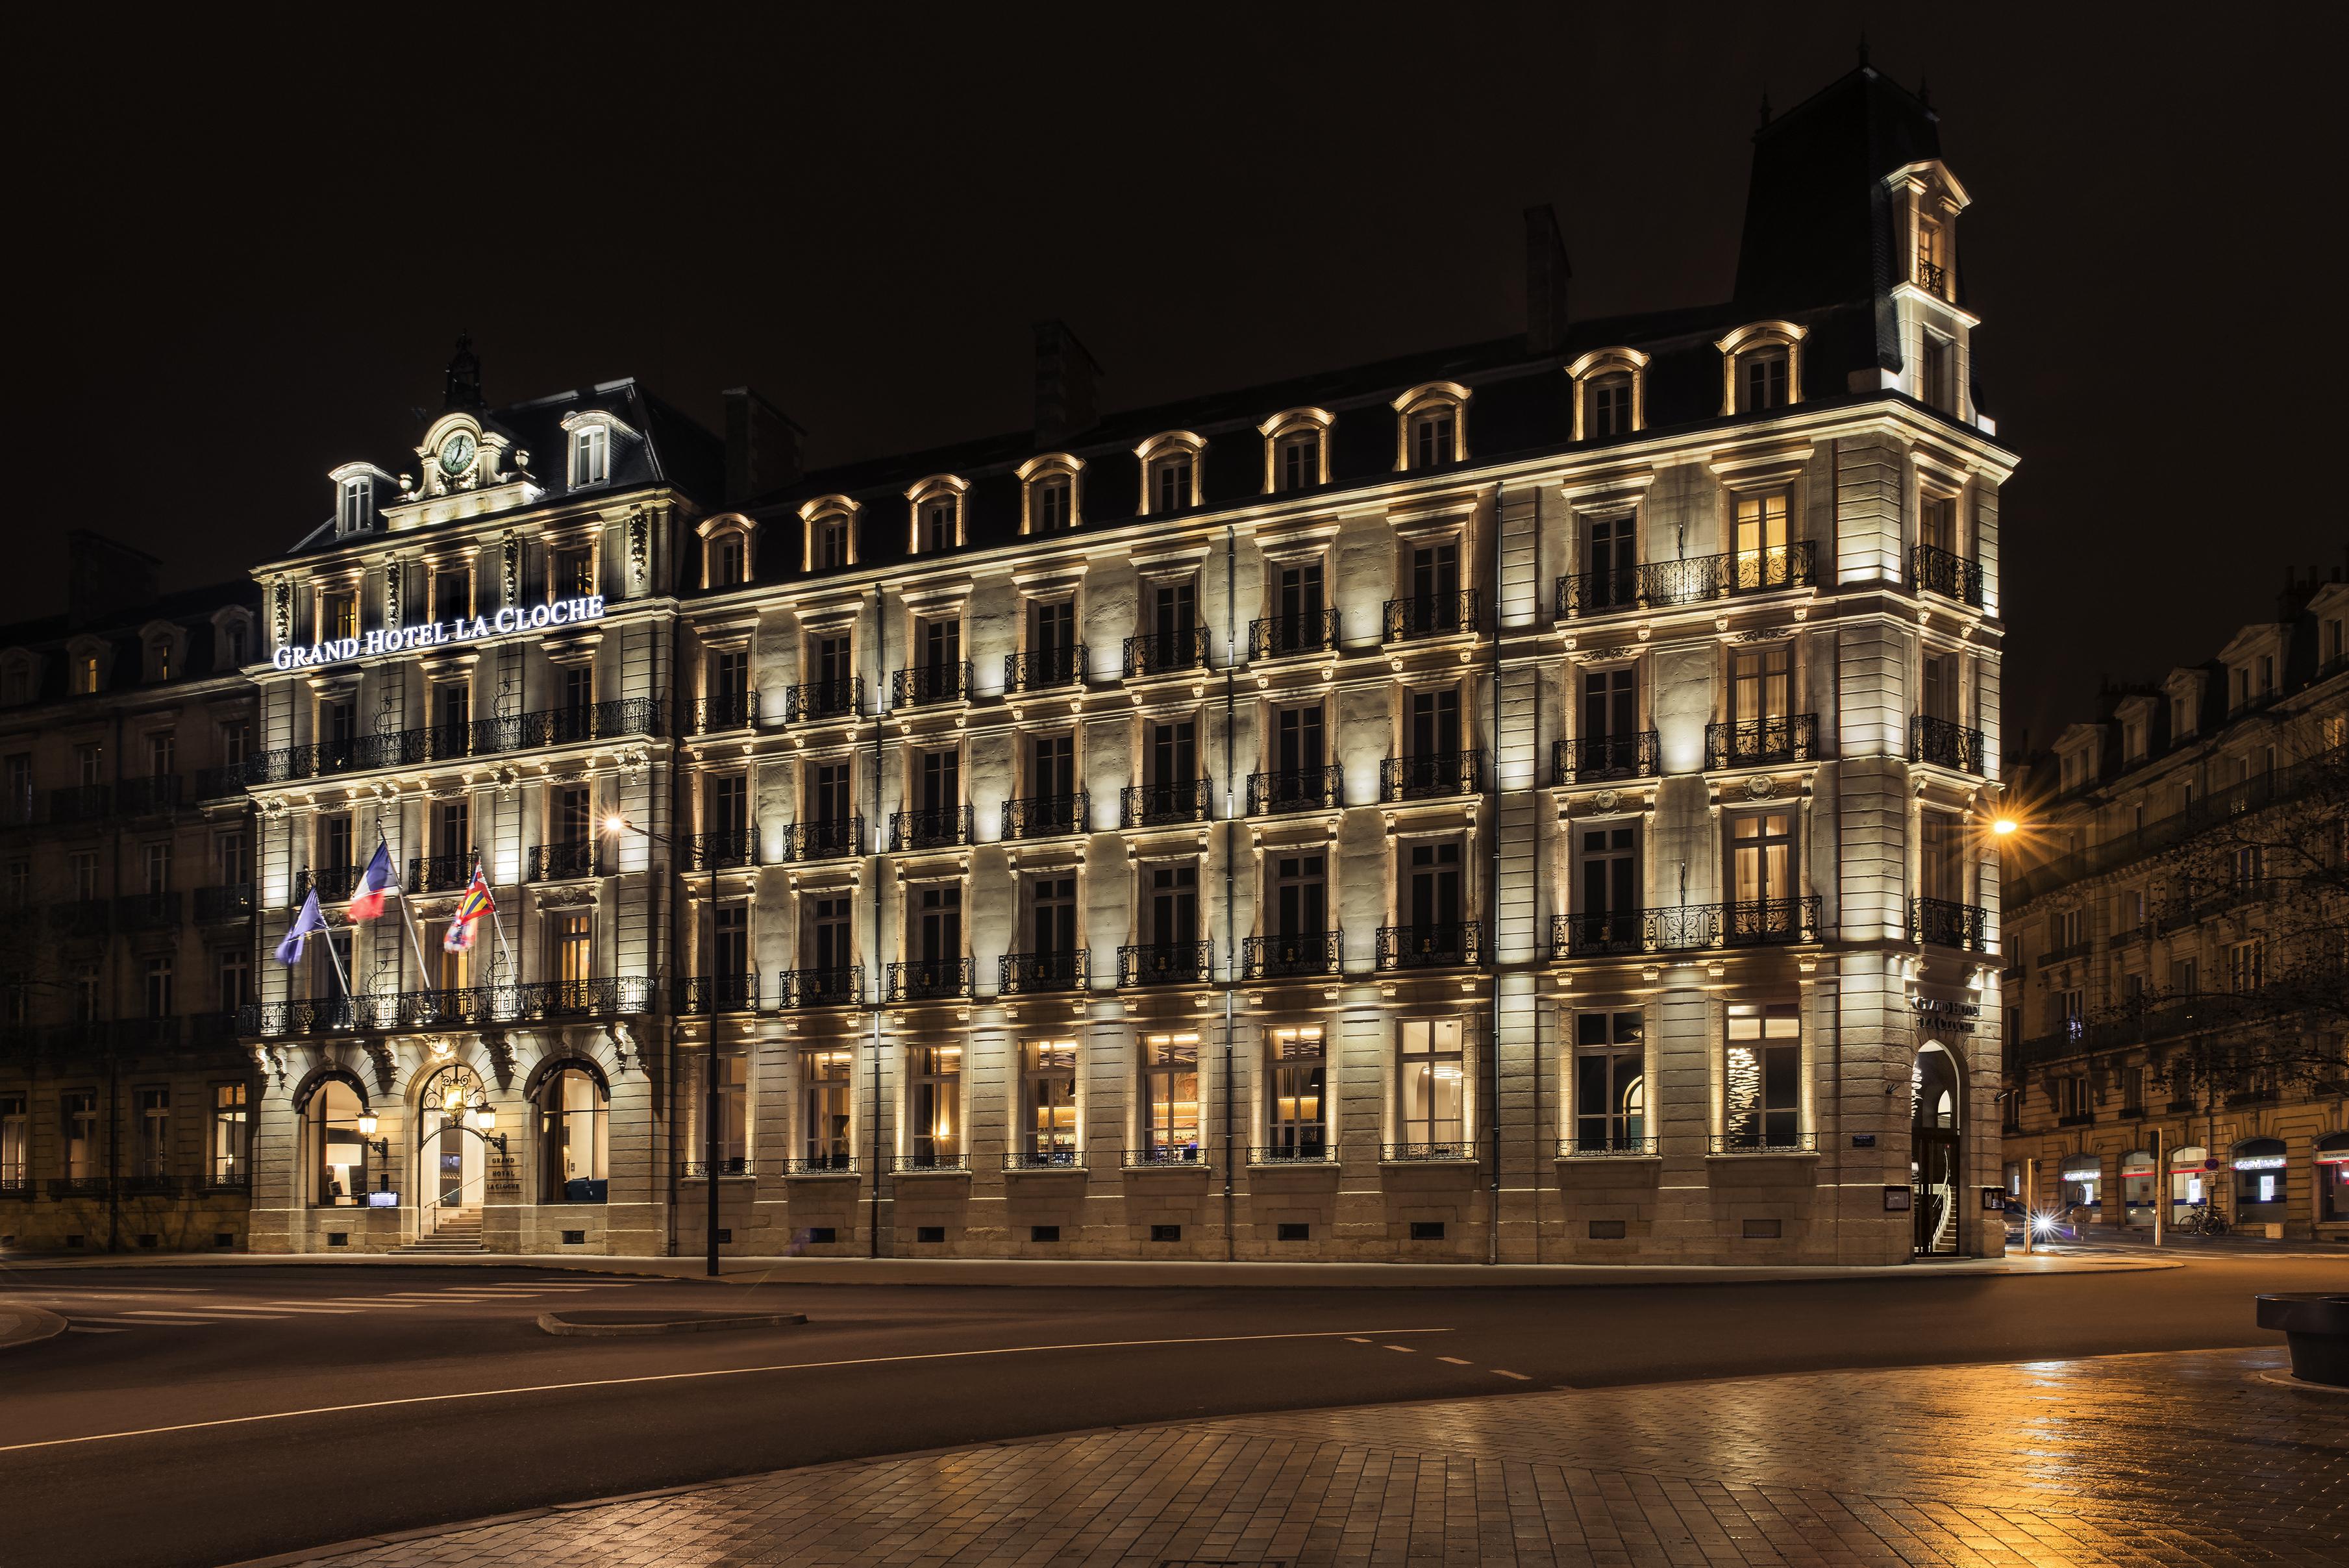 De nuit la façade de La Cloche, l'hôtel mythique de Dijon ( visuel Accor)